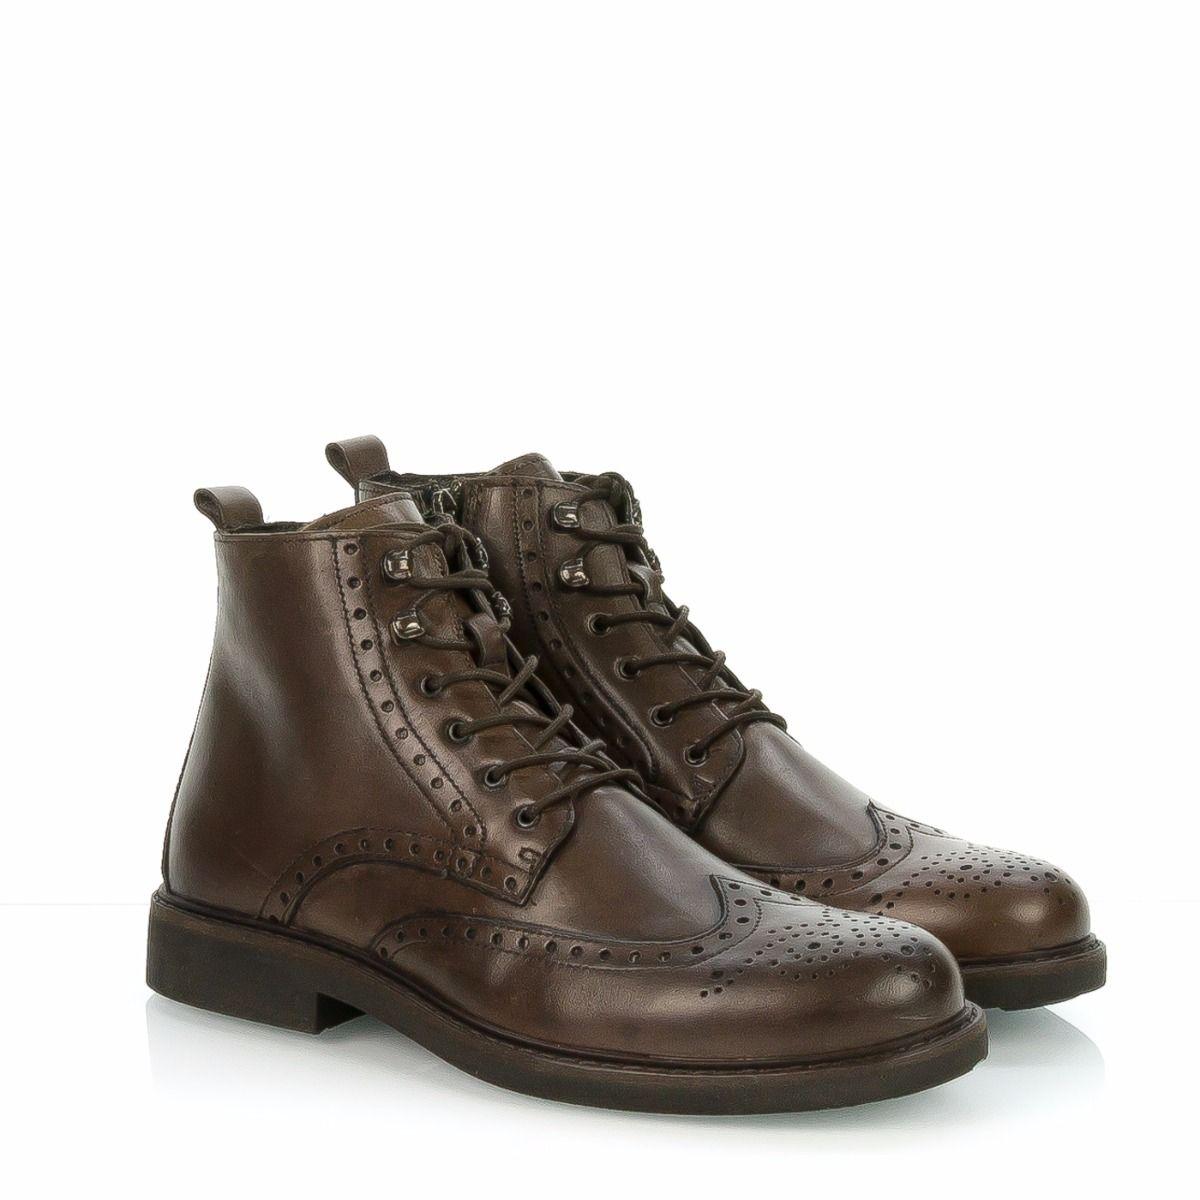 IGI CO scarpa stringata alta uomo 86731 00 6794d3eb5a9